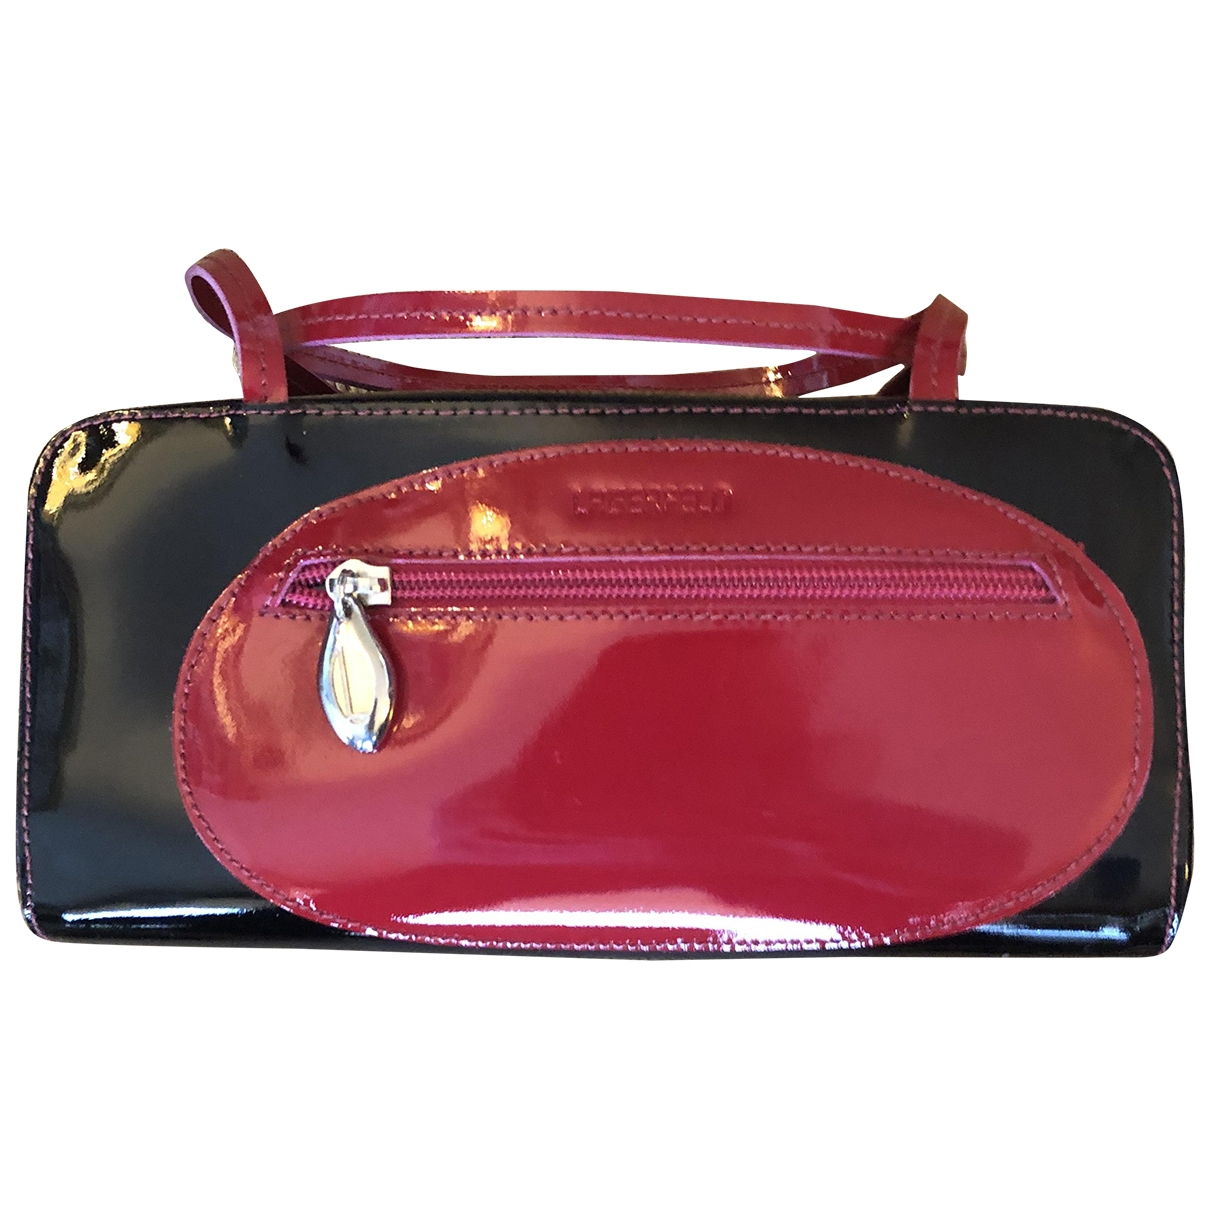 Karl Lagerfeld - Sac a main   pour femme en cuir verni - noir